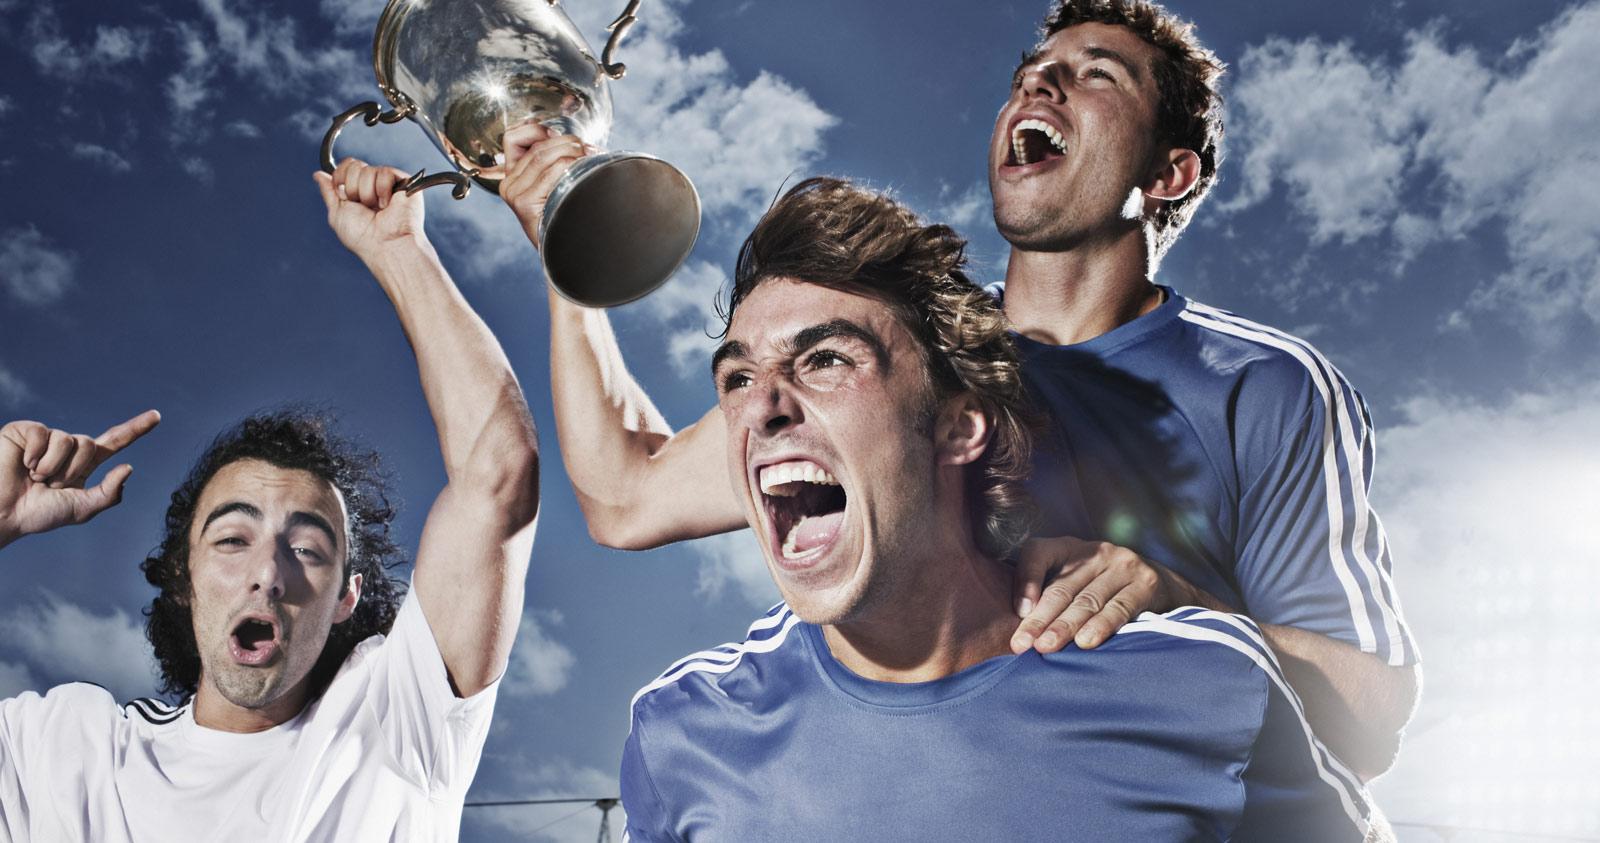 web-stortbilde-sport-mobil